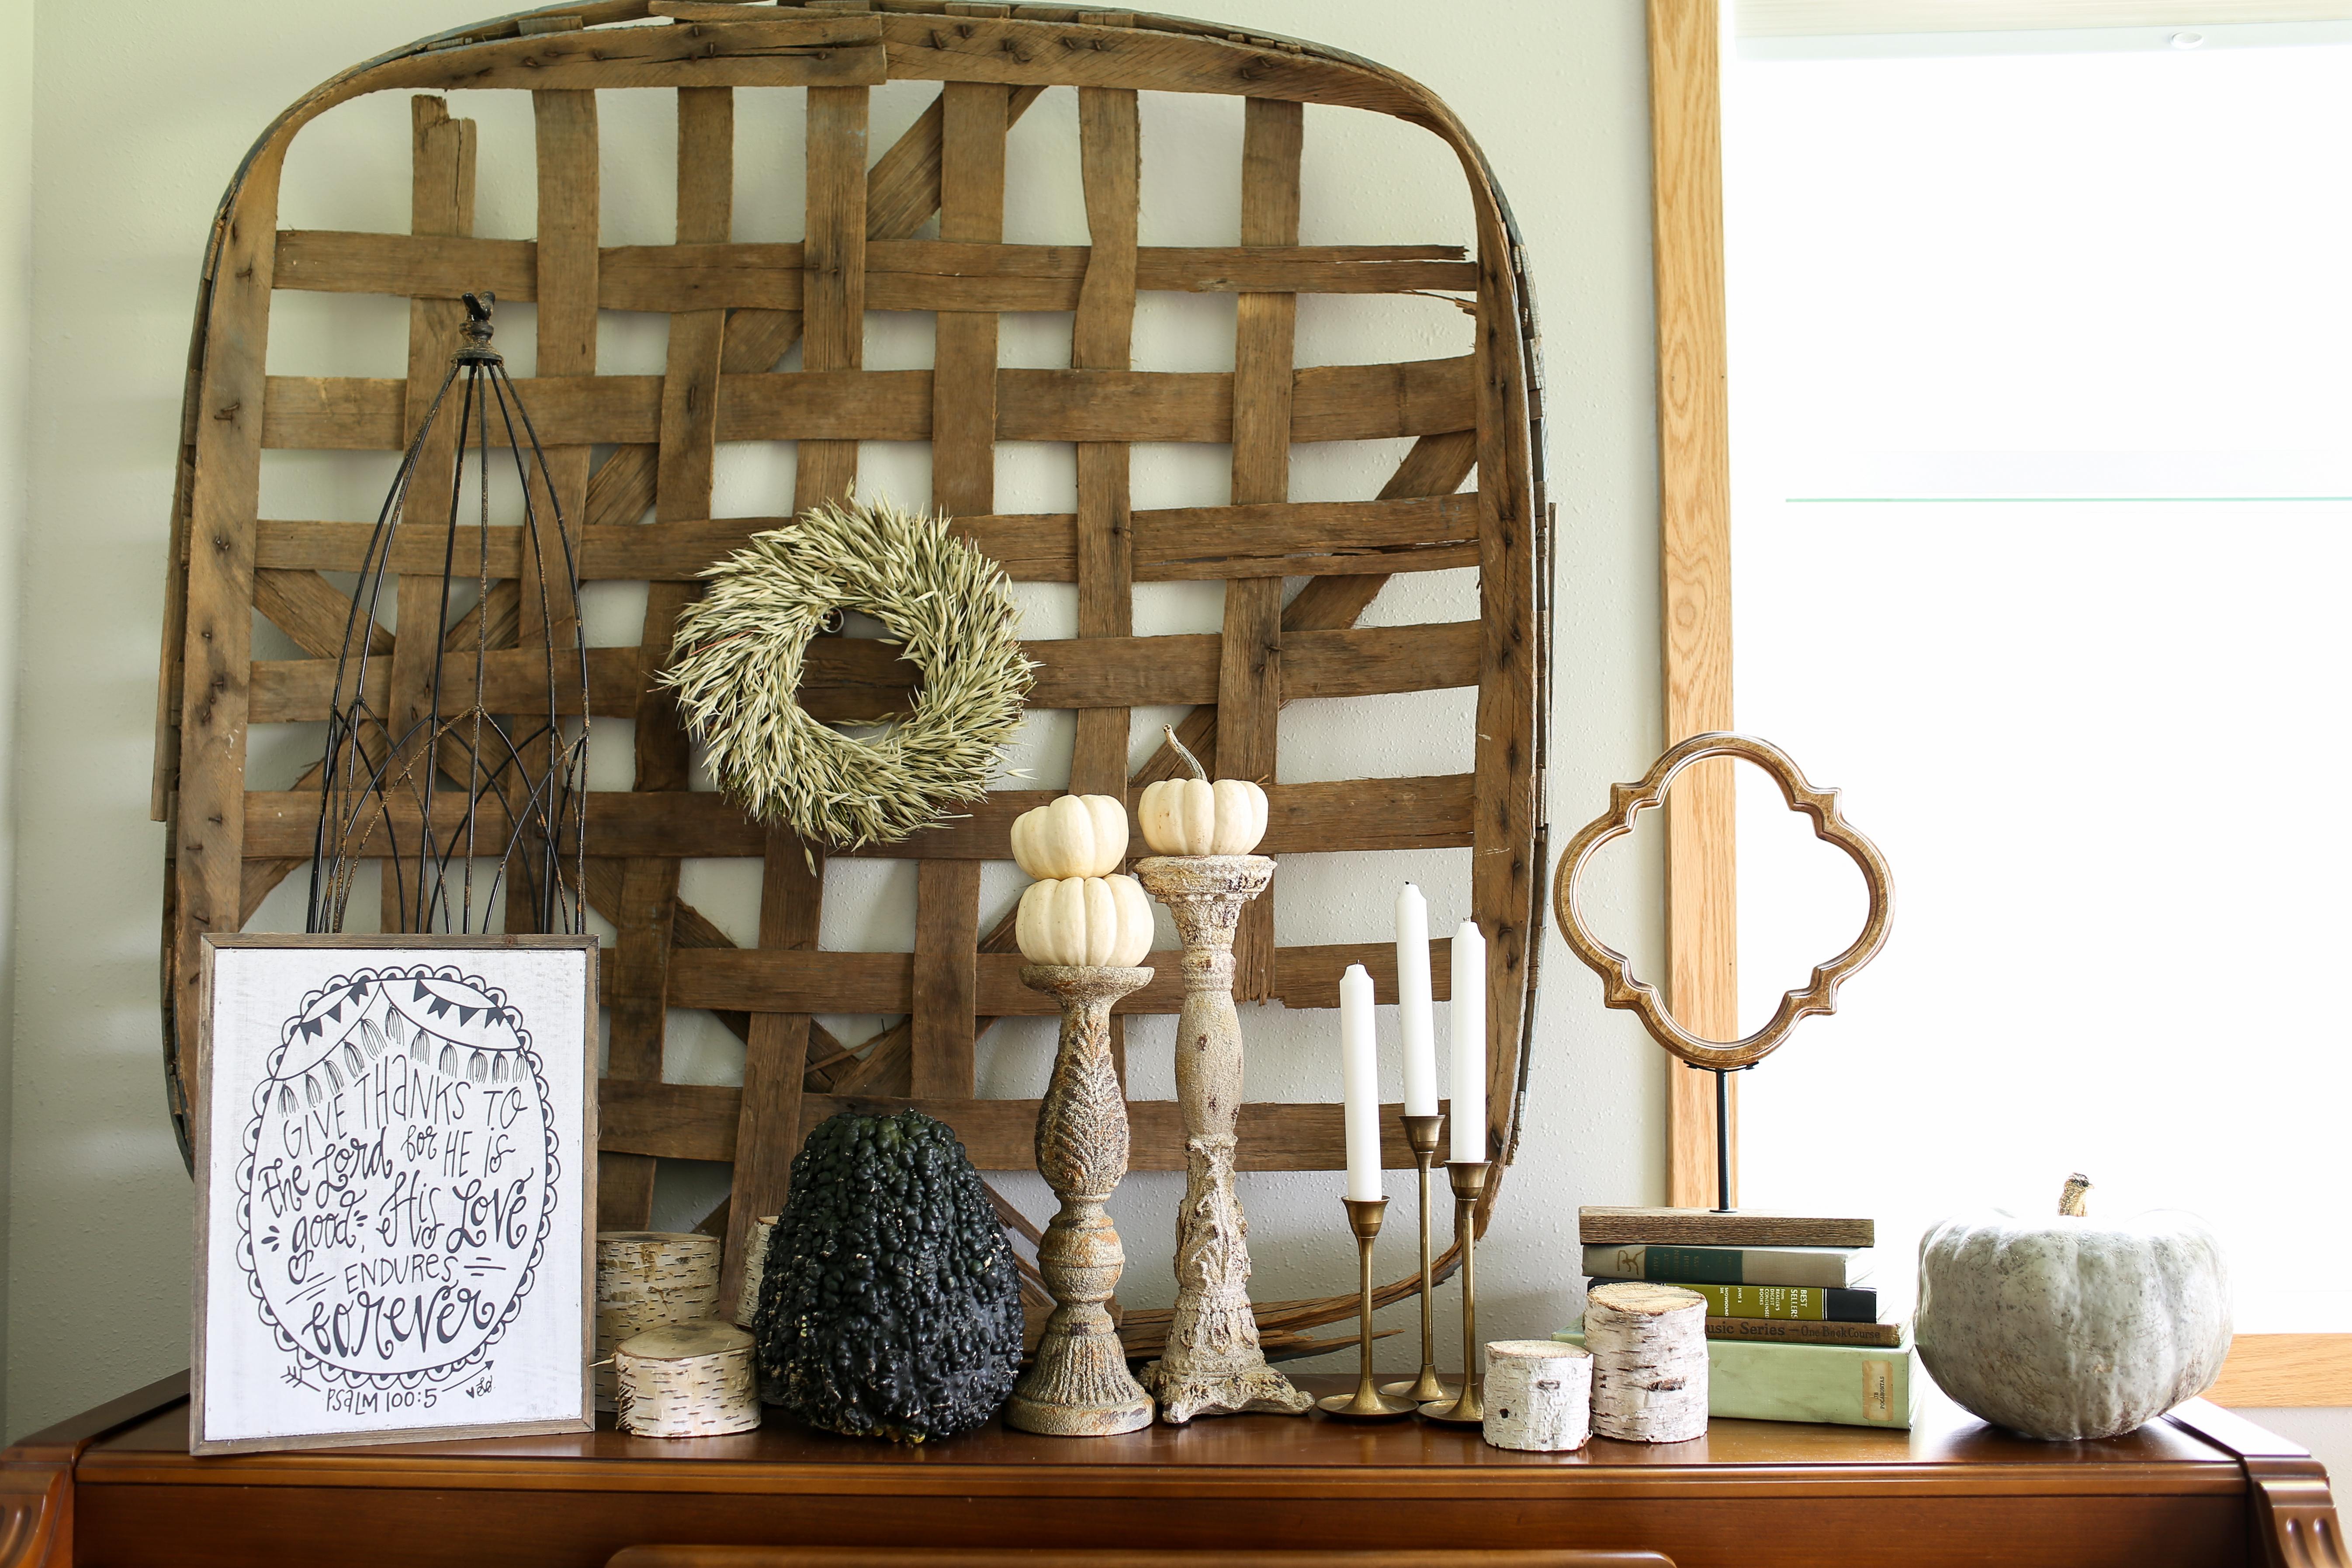 Farmhouse Decorating Ideas Pinterest: Fall Decor Ideas For The Rustic Farmhouse